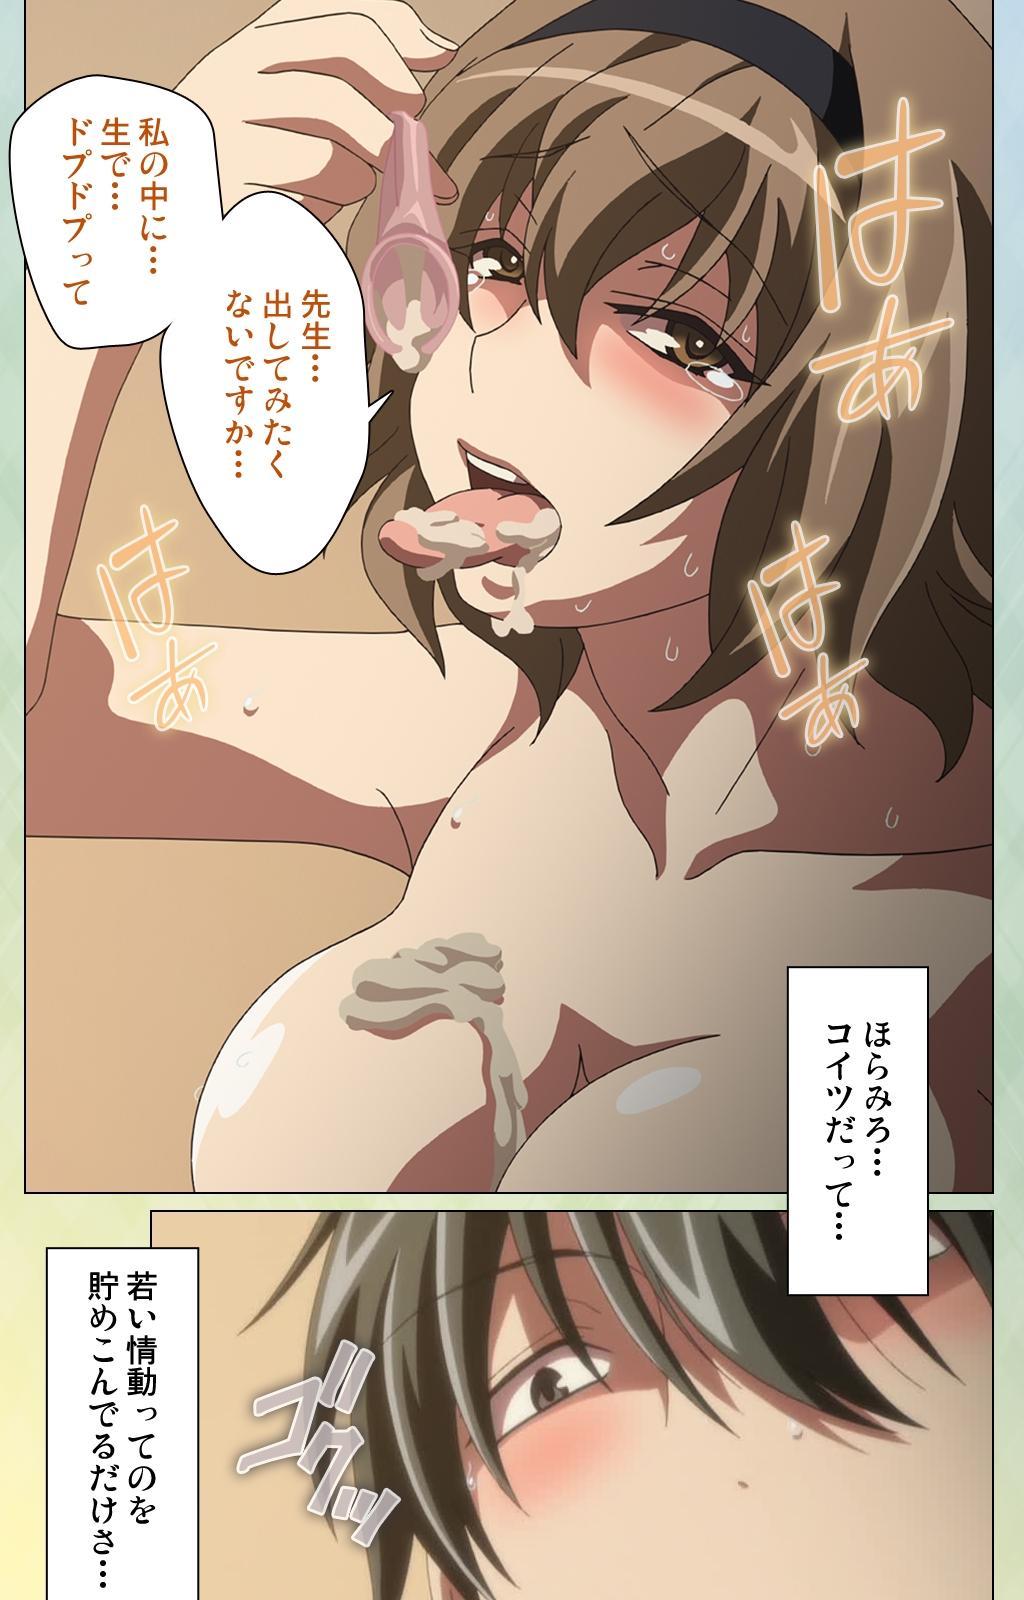 Furueru Kuchibiru fuzzy lips0 Complete Ban 23